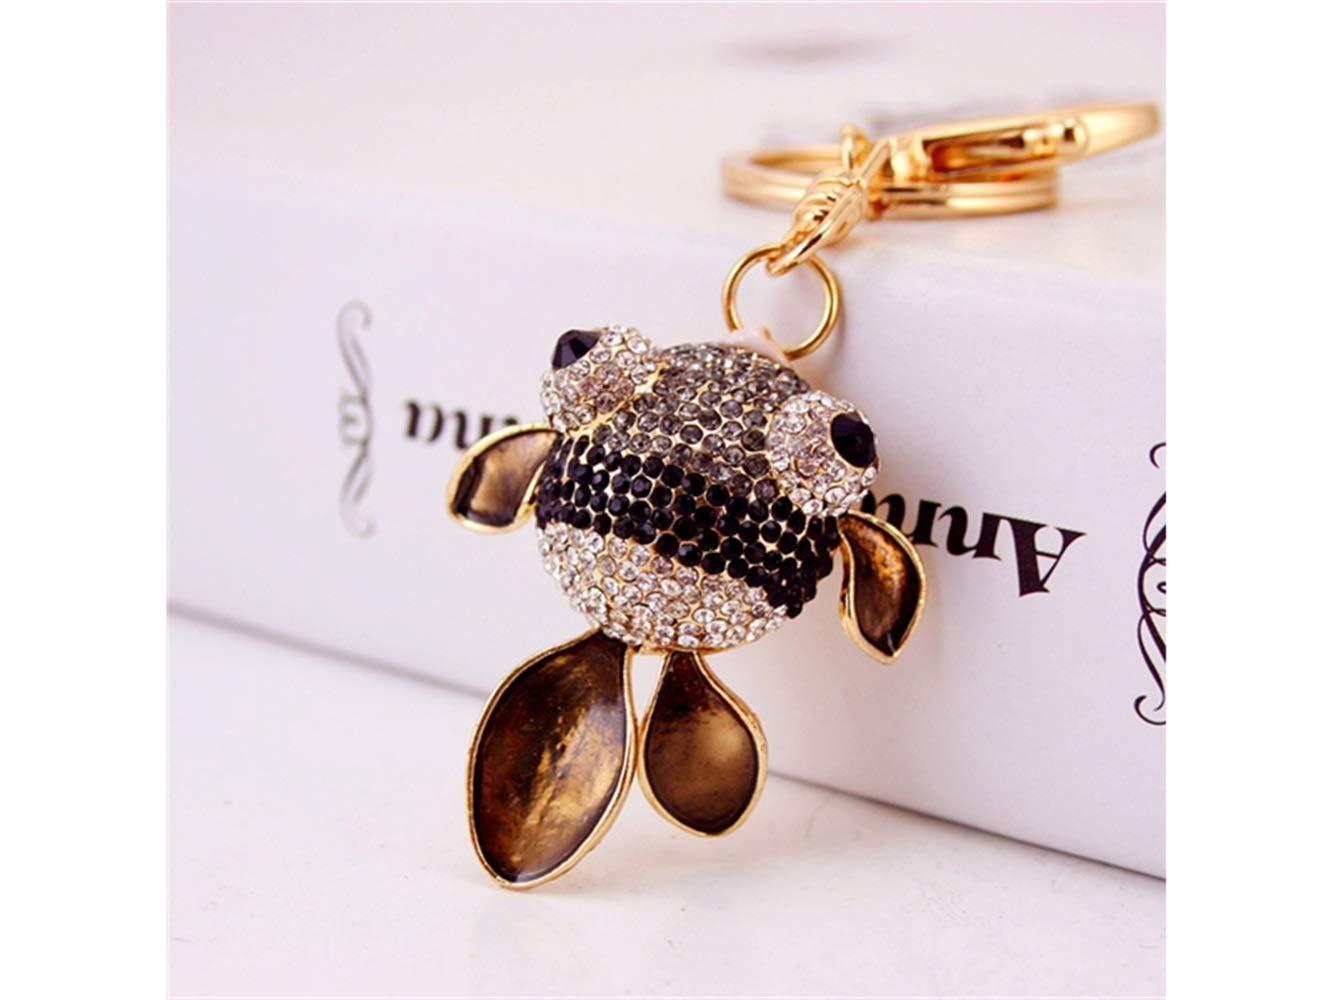 Car Keychain, Cute Diamond Goldfish Keychain Animal Key Trinket Car Bag Key Holder Decorations(Black) for Gift